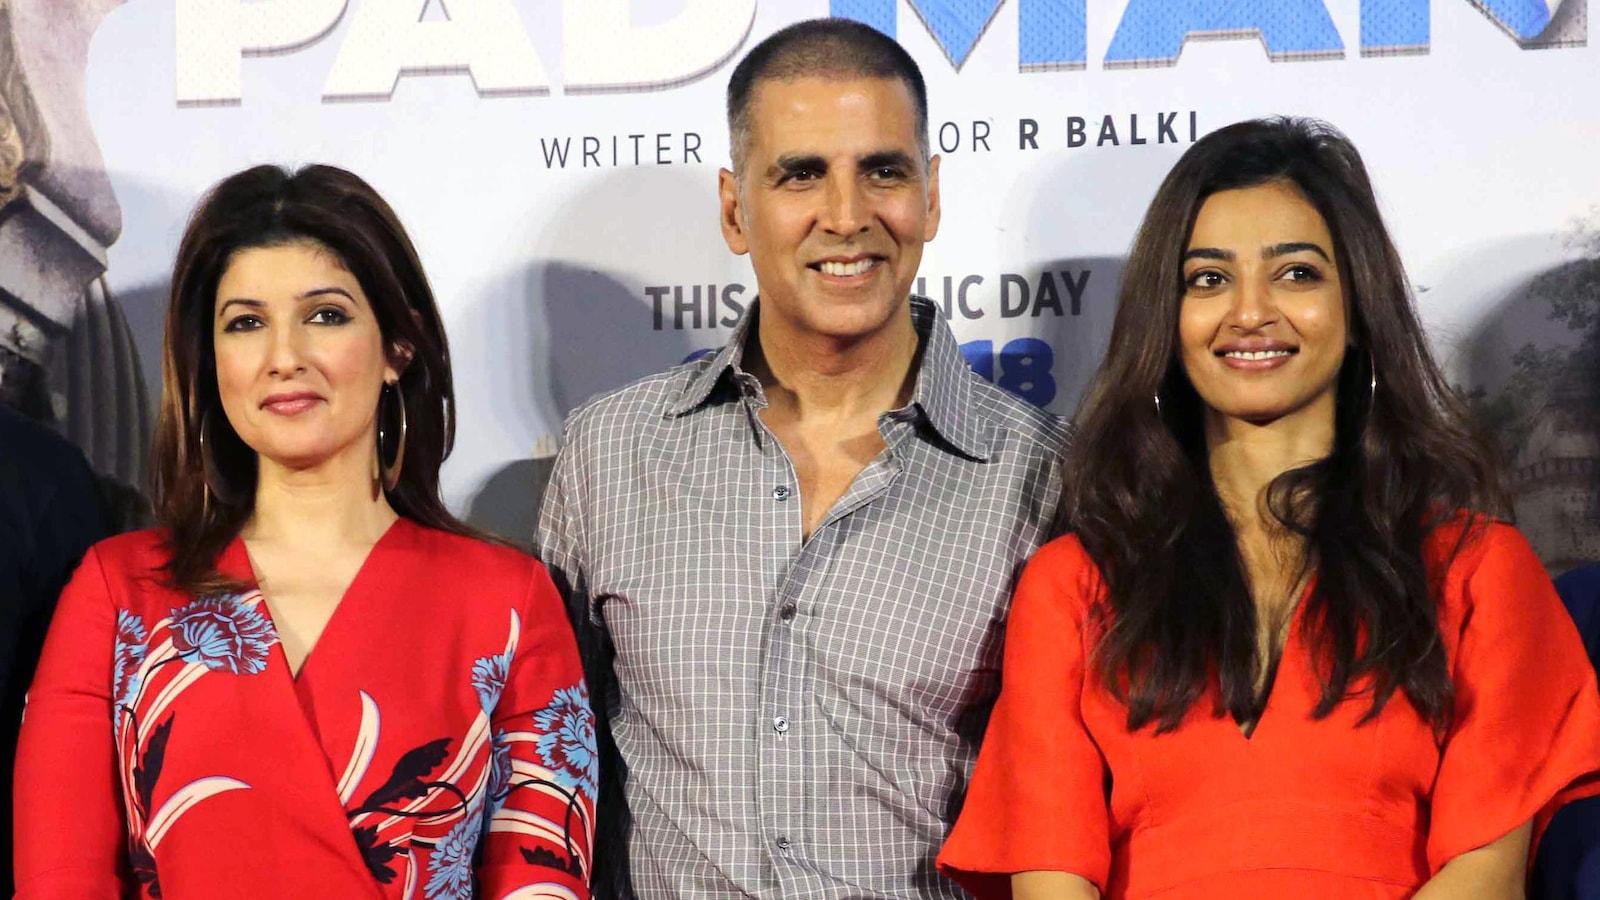 Les vedettes de Bollywood Twinkle Khanna, son mari Akshay Kumar et Radhika Apte